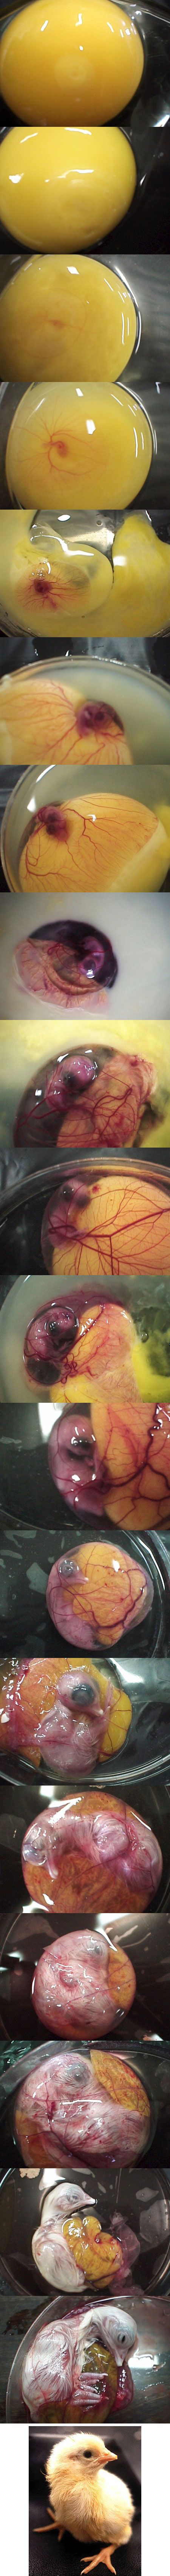 birth of a chicken egg formation